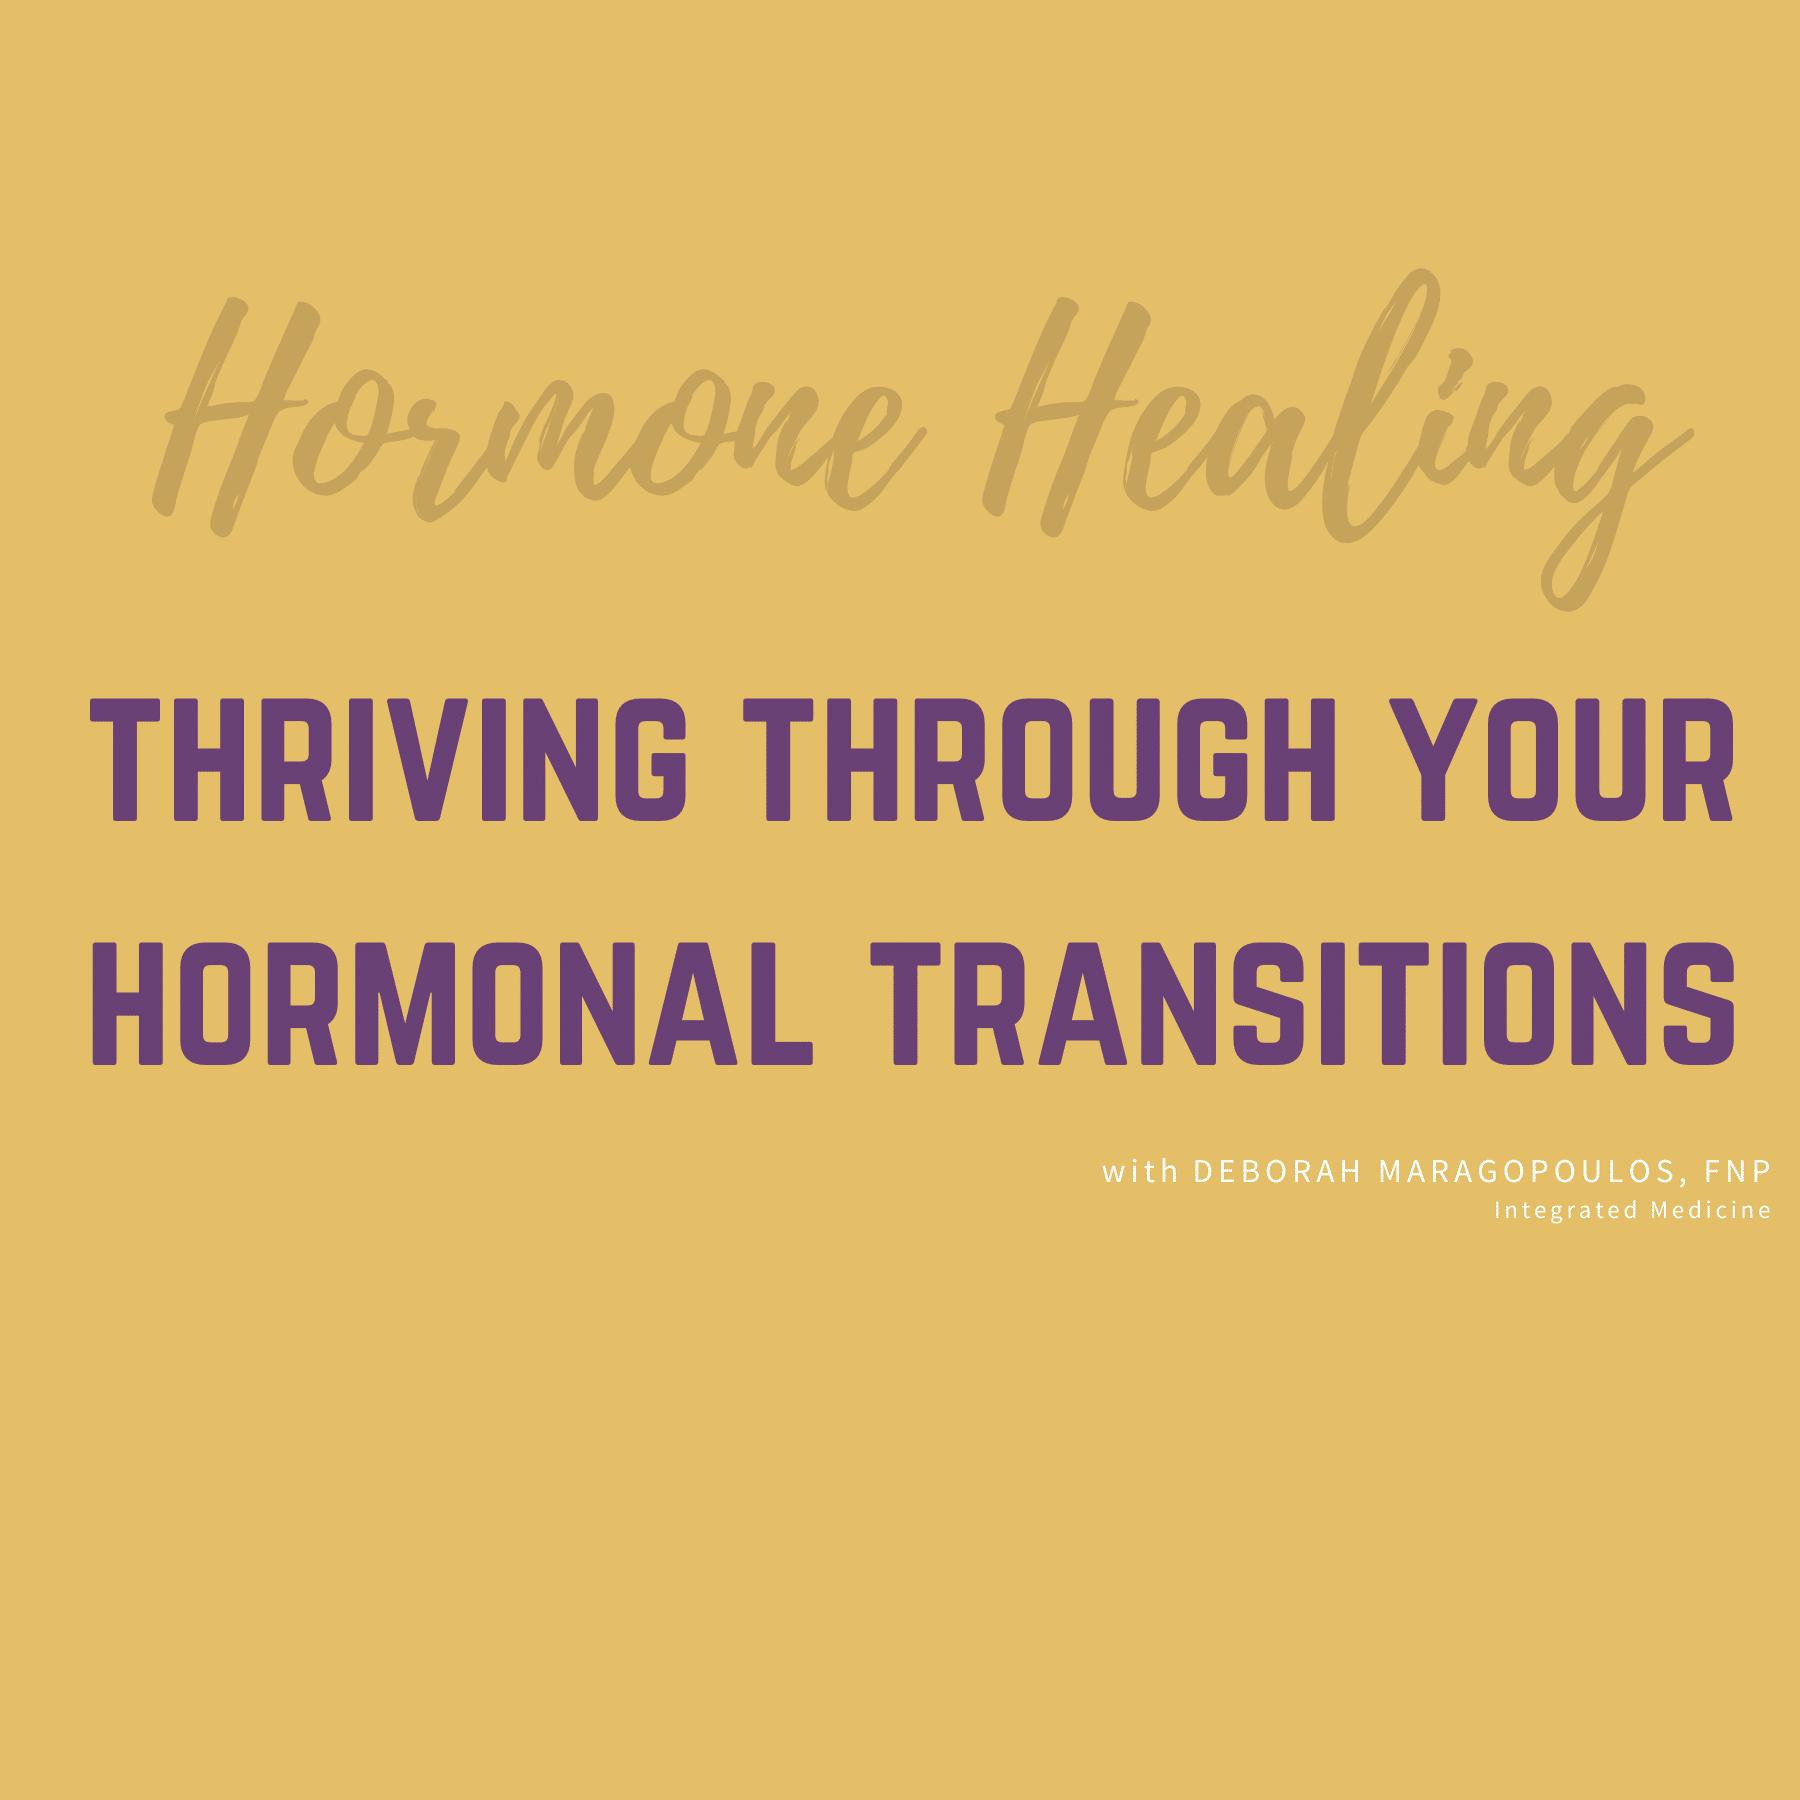 thriving through hormonal